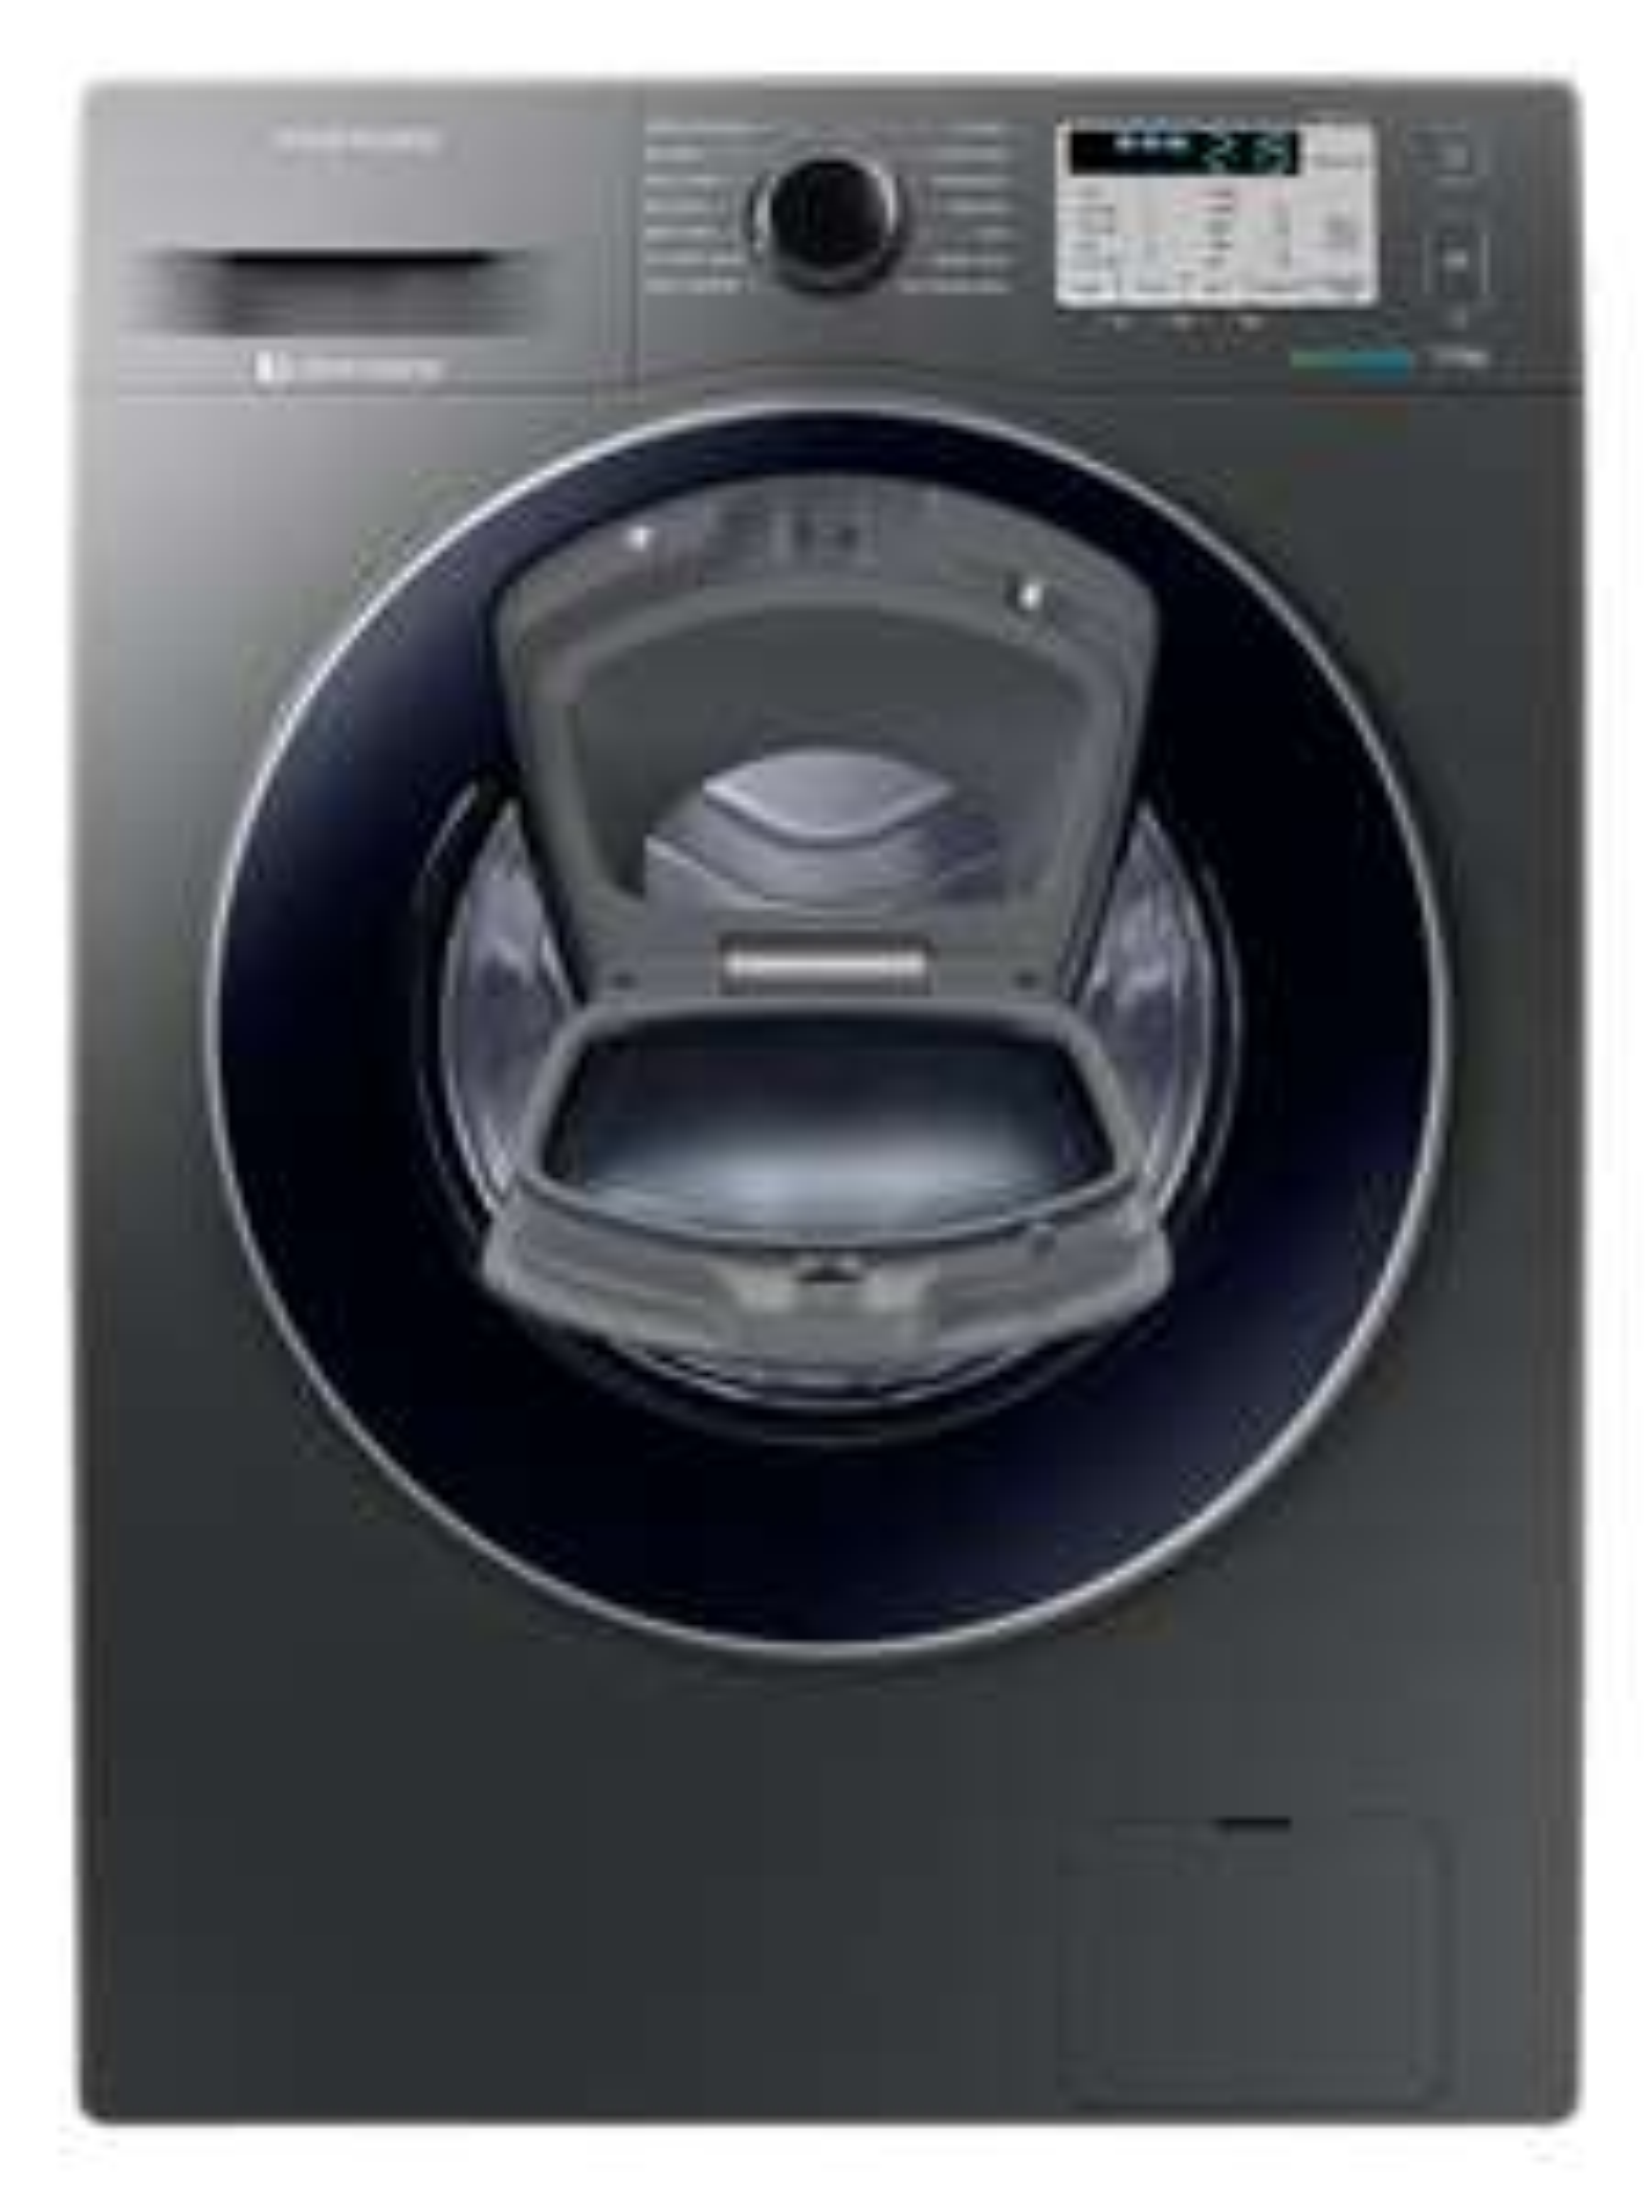 Samsung WW70K5413UX/EU 7kg Load, 1400 Spin AddWash™ Washing Machine with Ecobubble™ and 5yr Samsung Warranty - Graphite £429.99 VERY